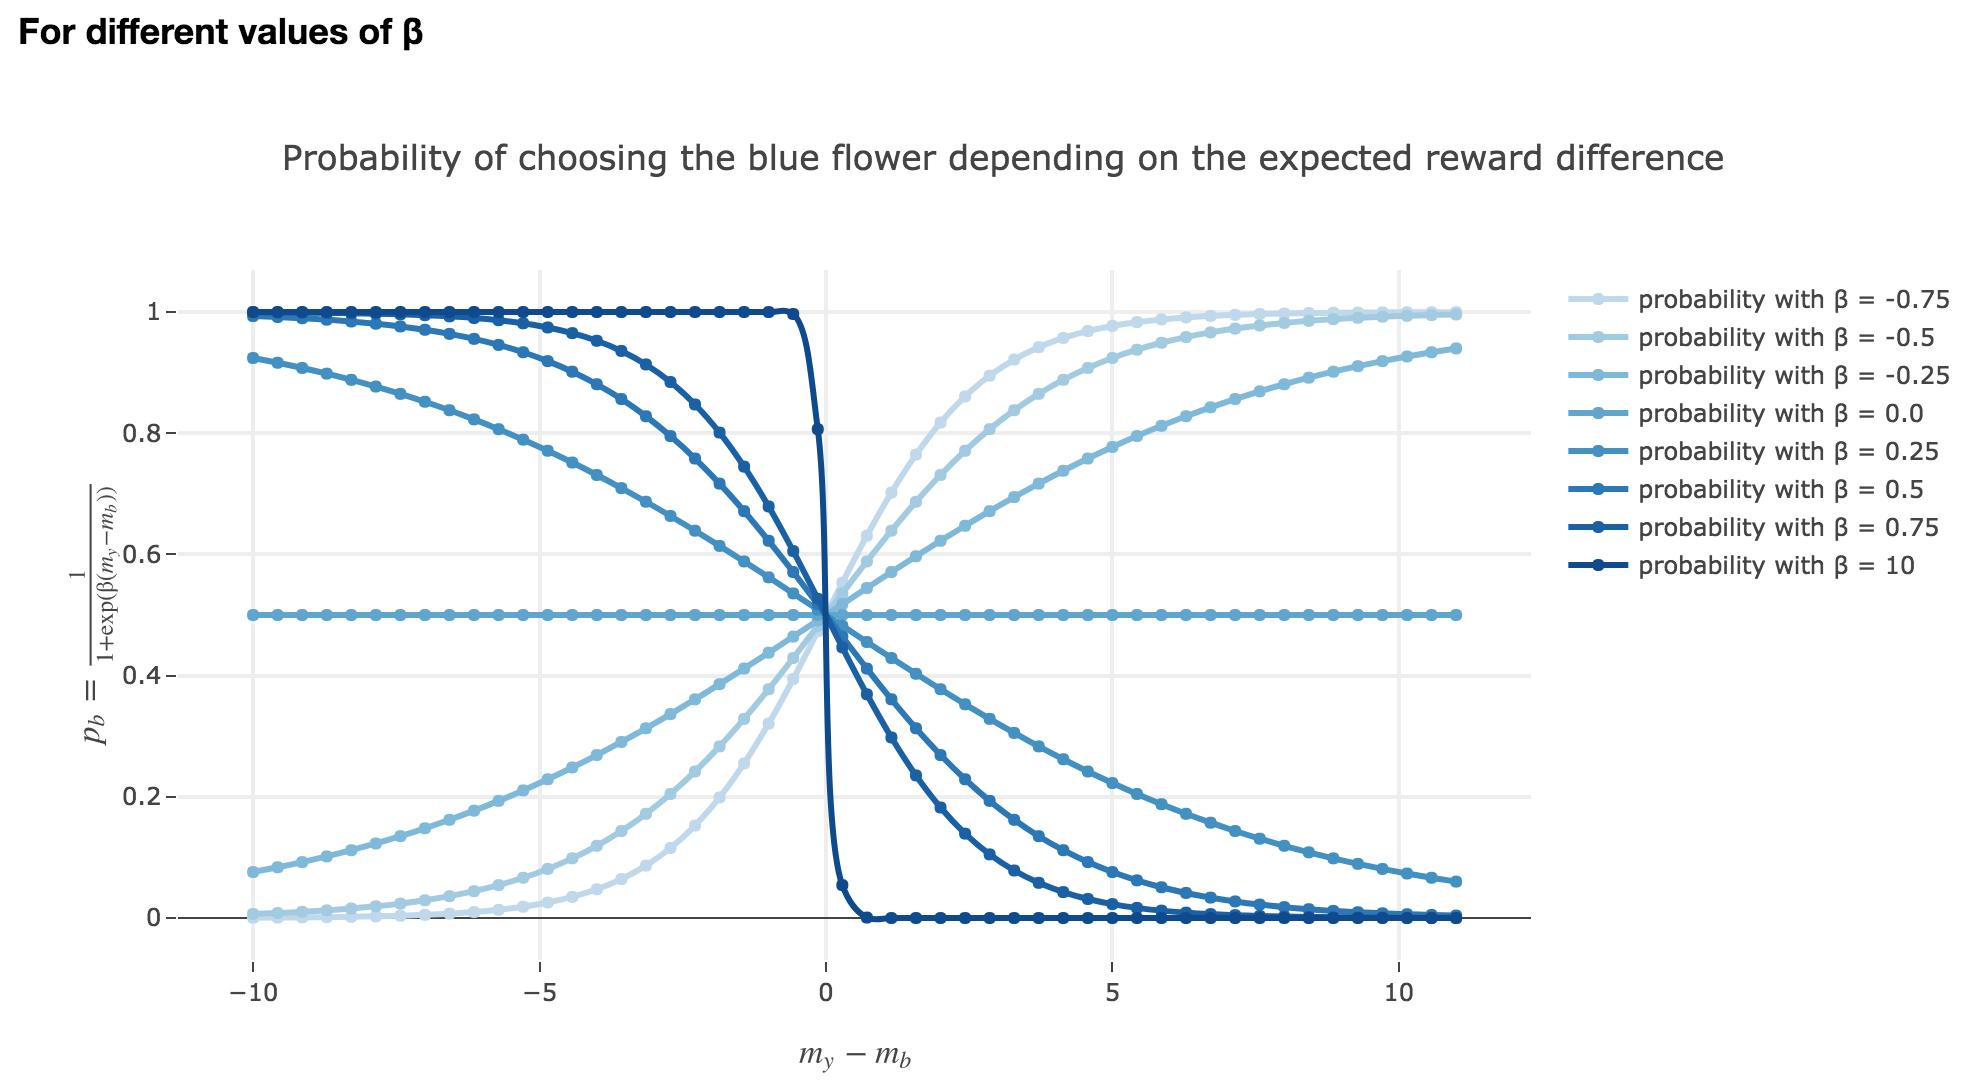 Figure 4.1.